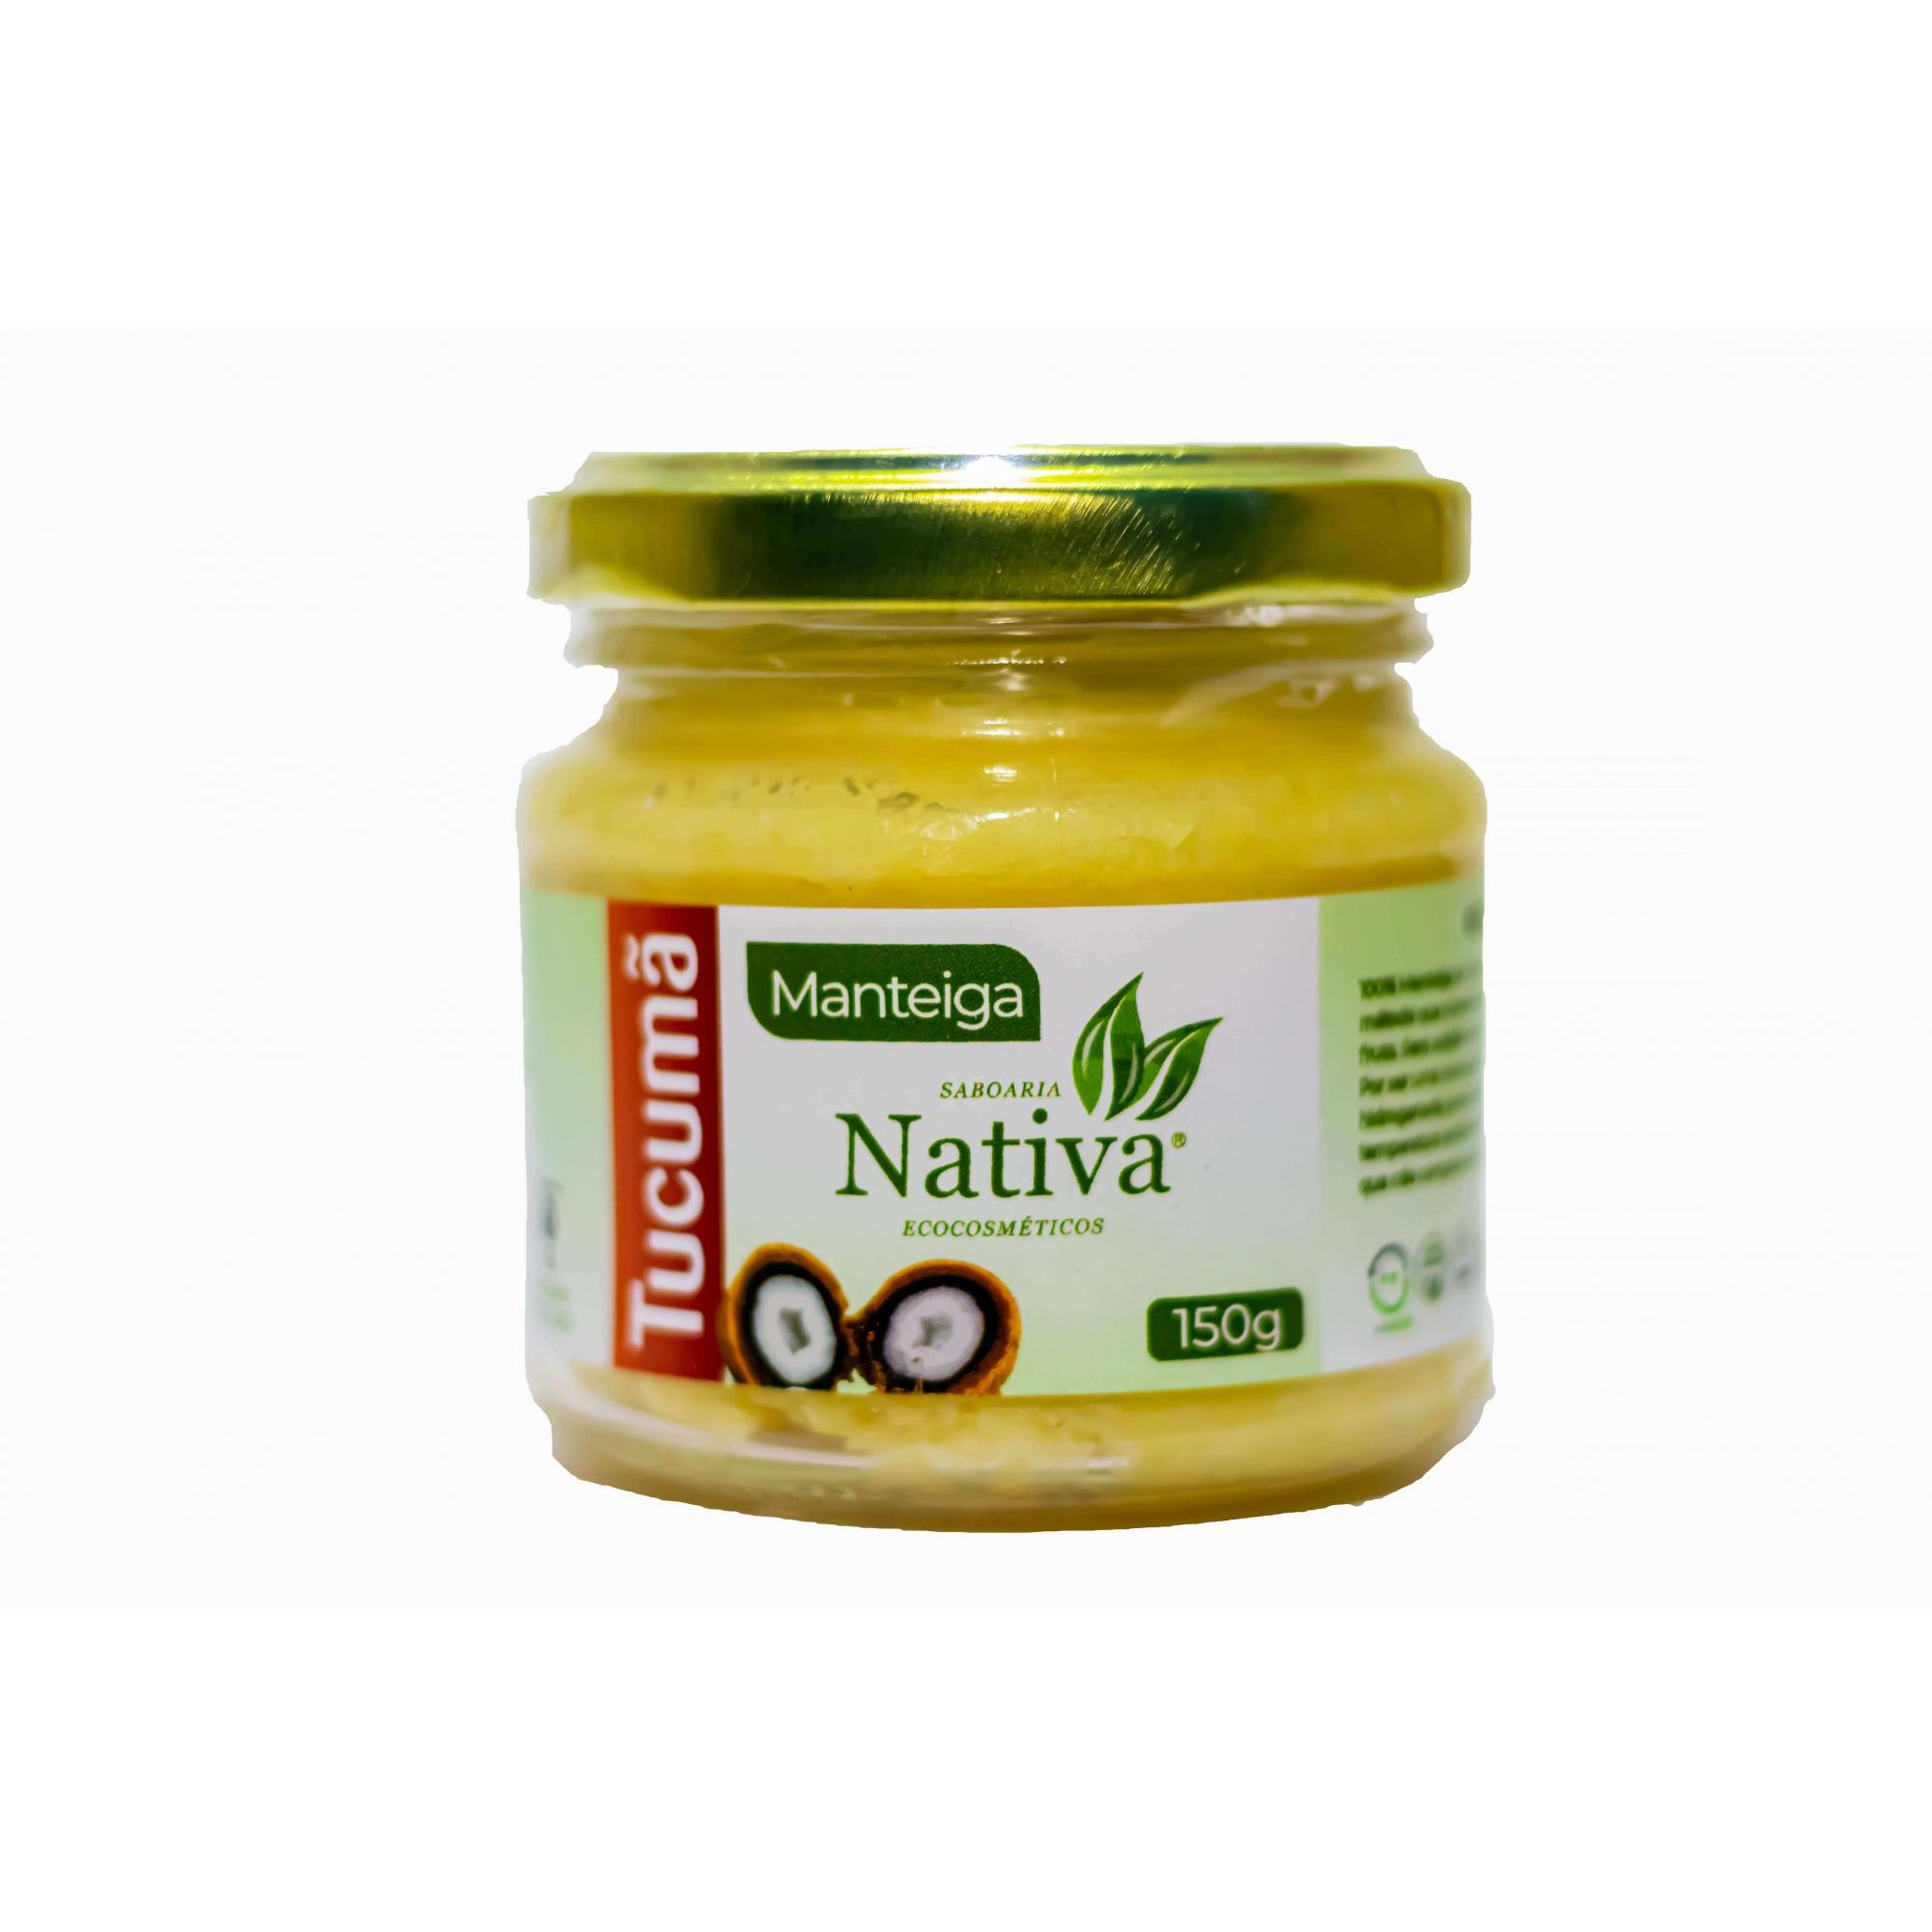 Manteiga de Tucumã - 150g  - Saboaria Nativa Ecocosméticos